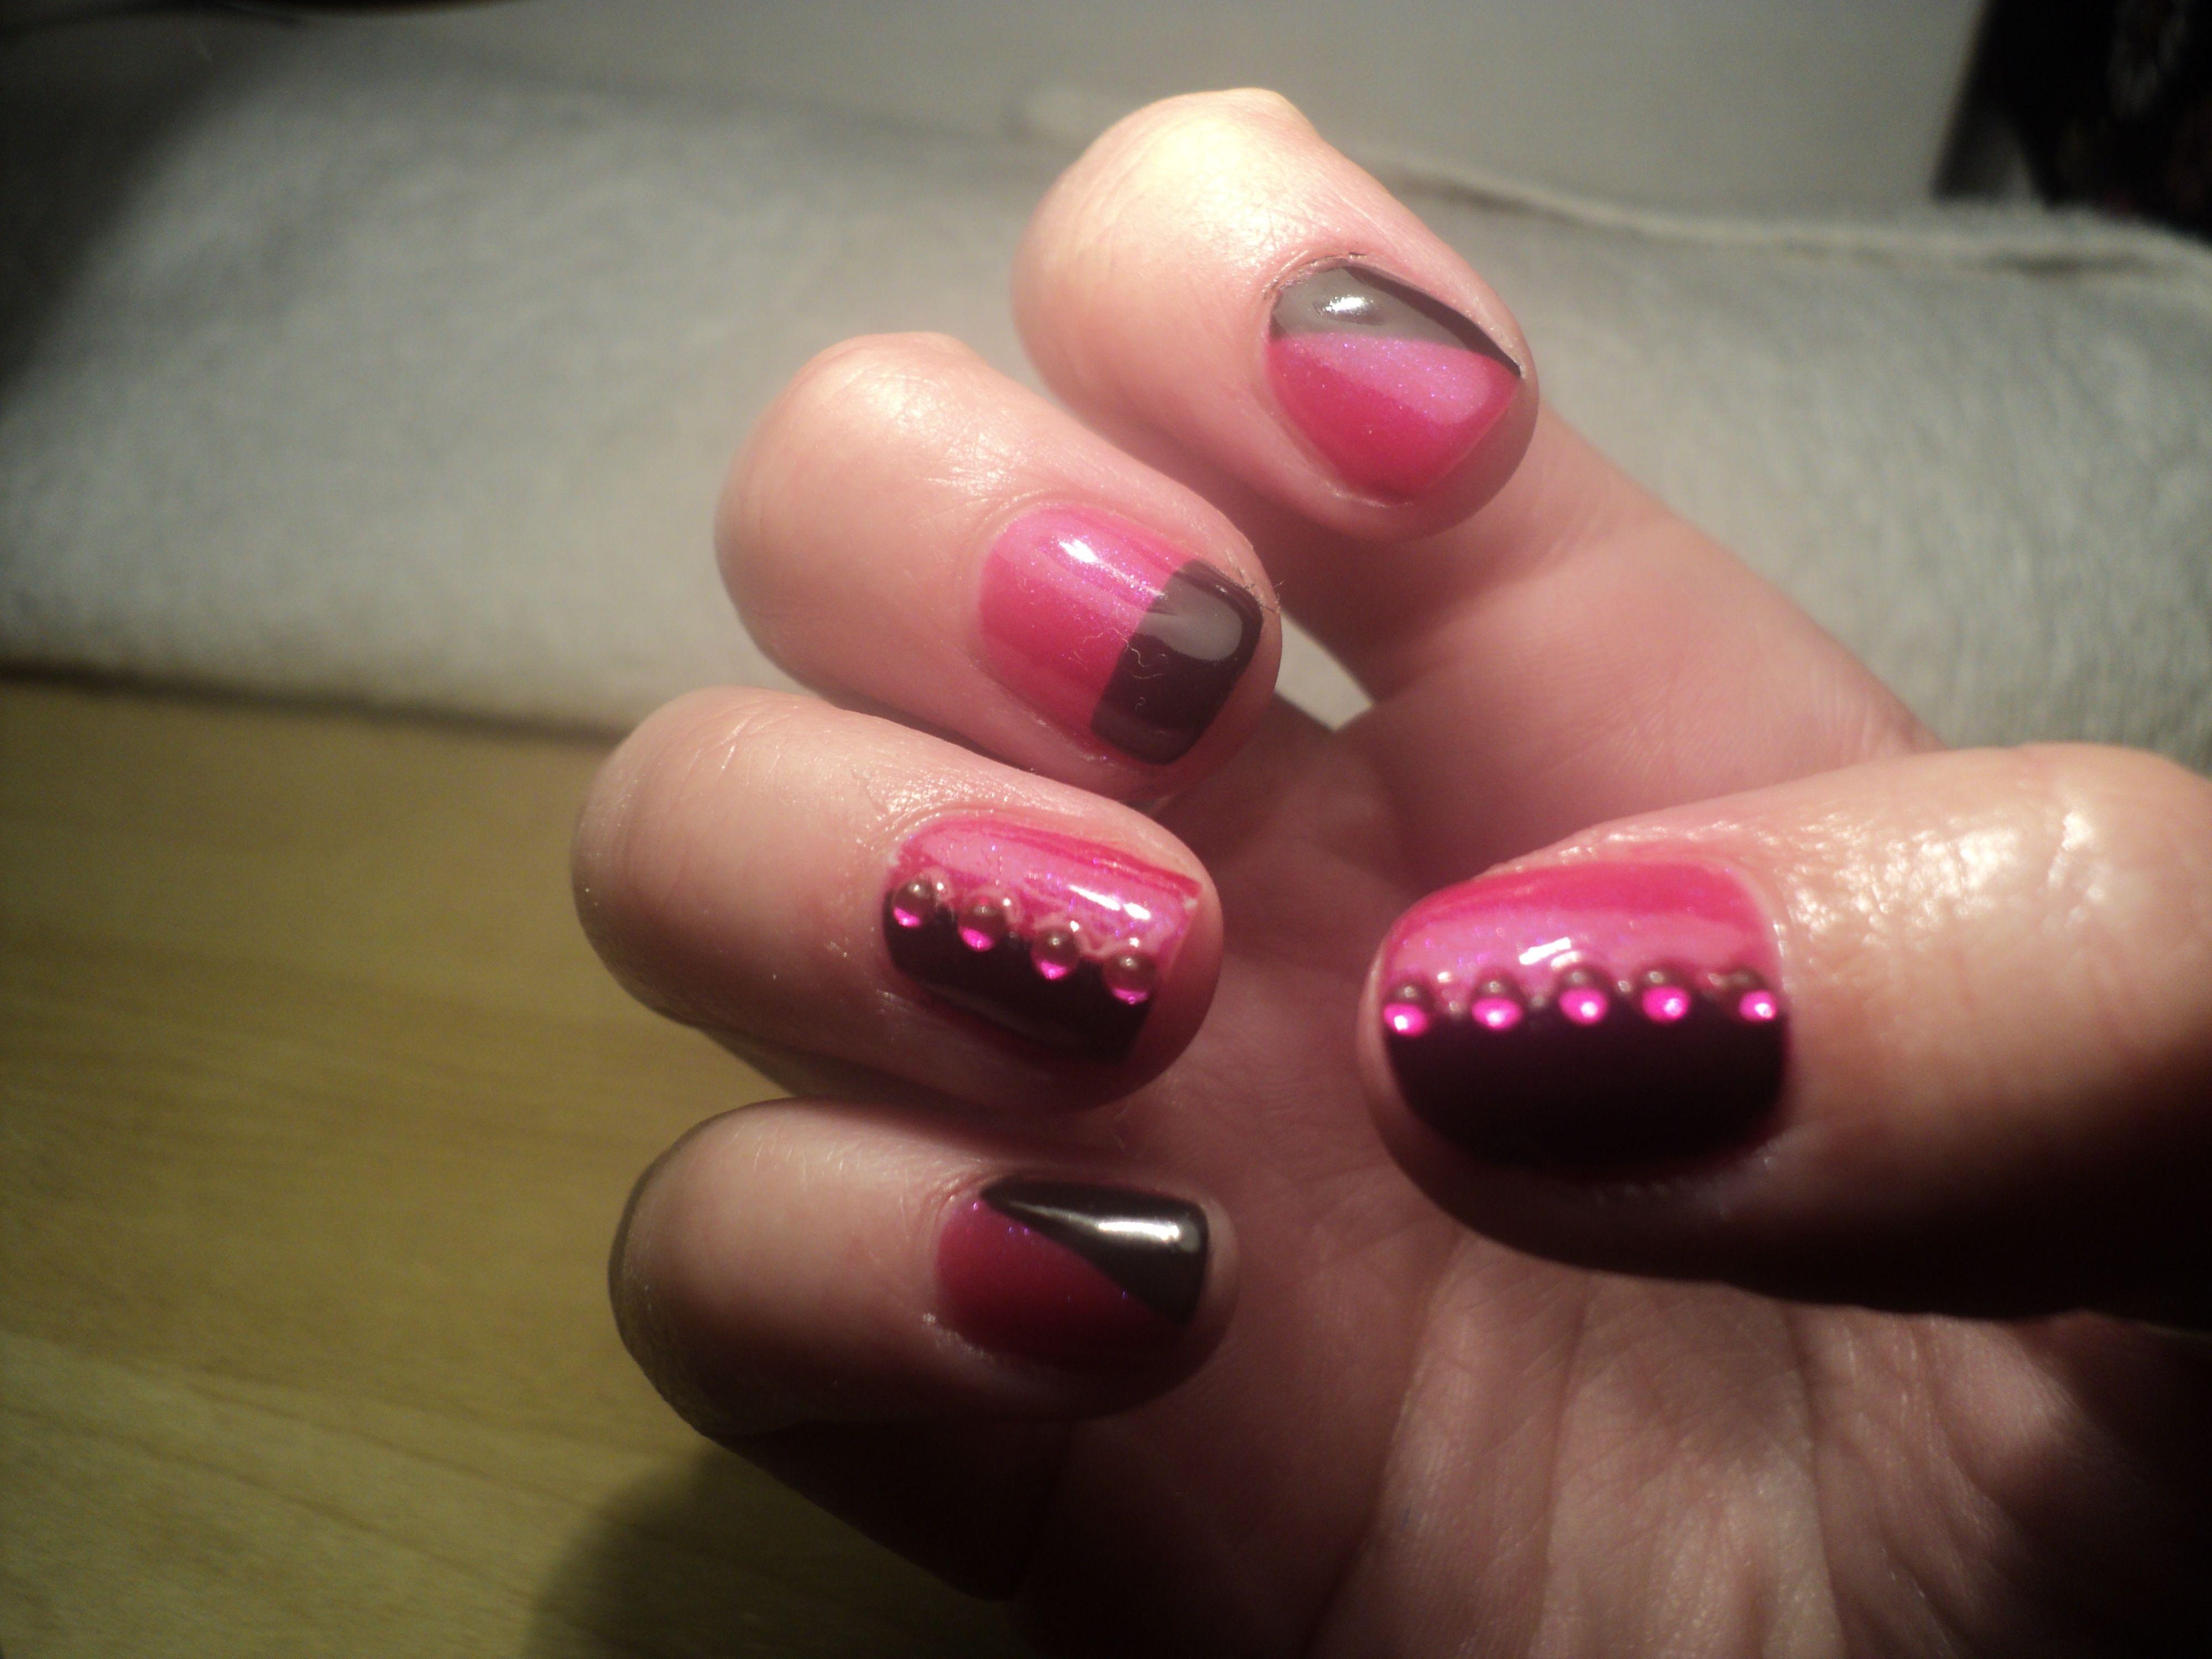 Young Nails Mani-q Gel colour polish! | Luscious Nails - By Cara ...